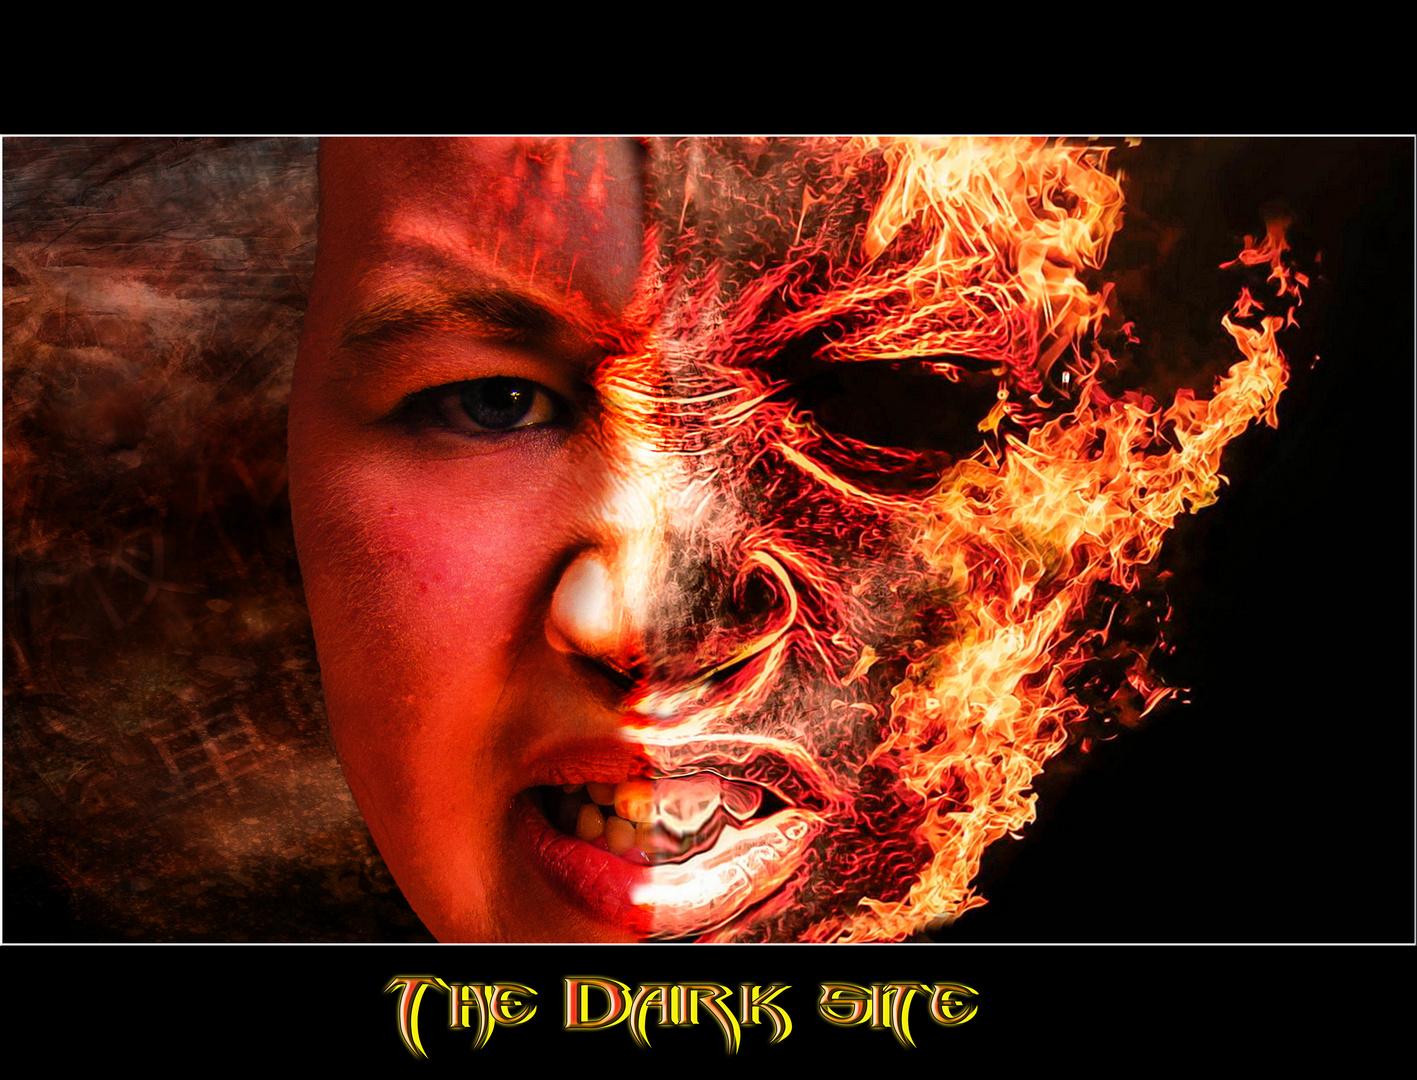 The Dark site